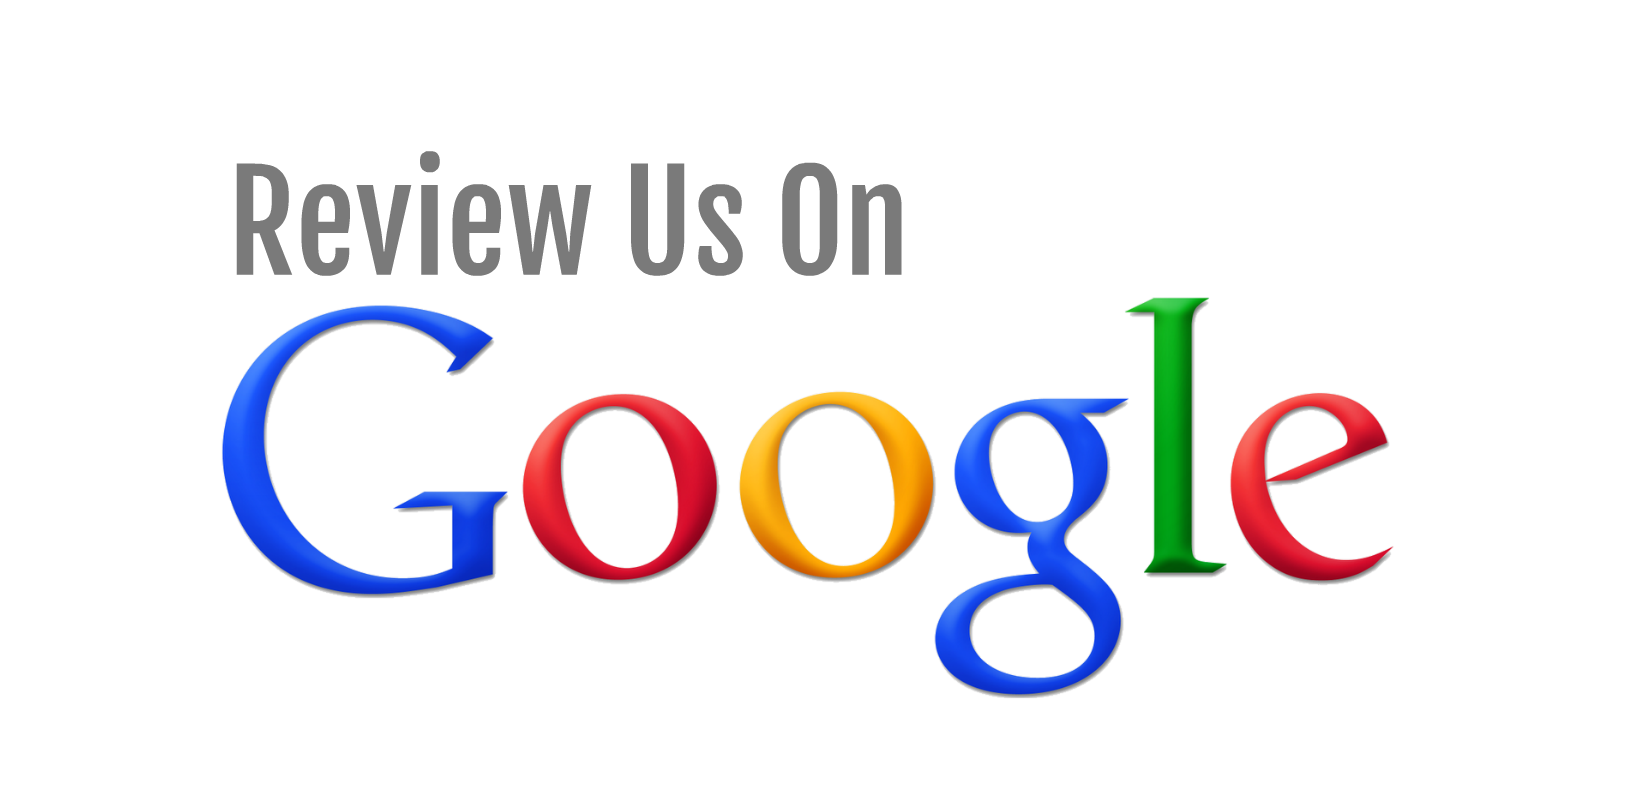 Get More Google Reviews Googlereviews Googlebusiness Google Logo Google Trends Google Adsense